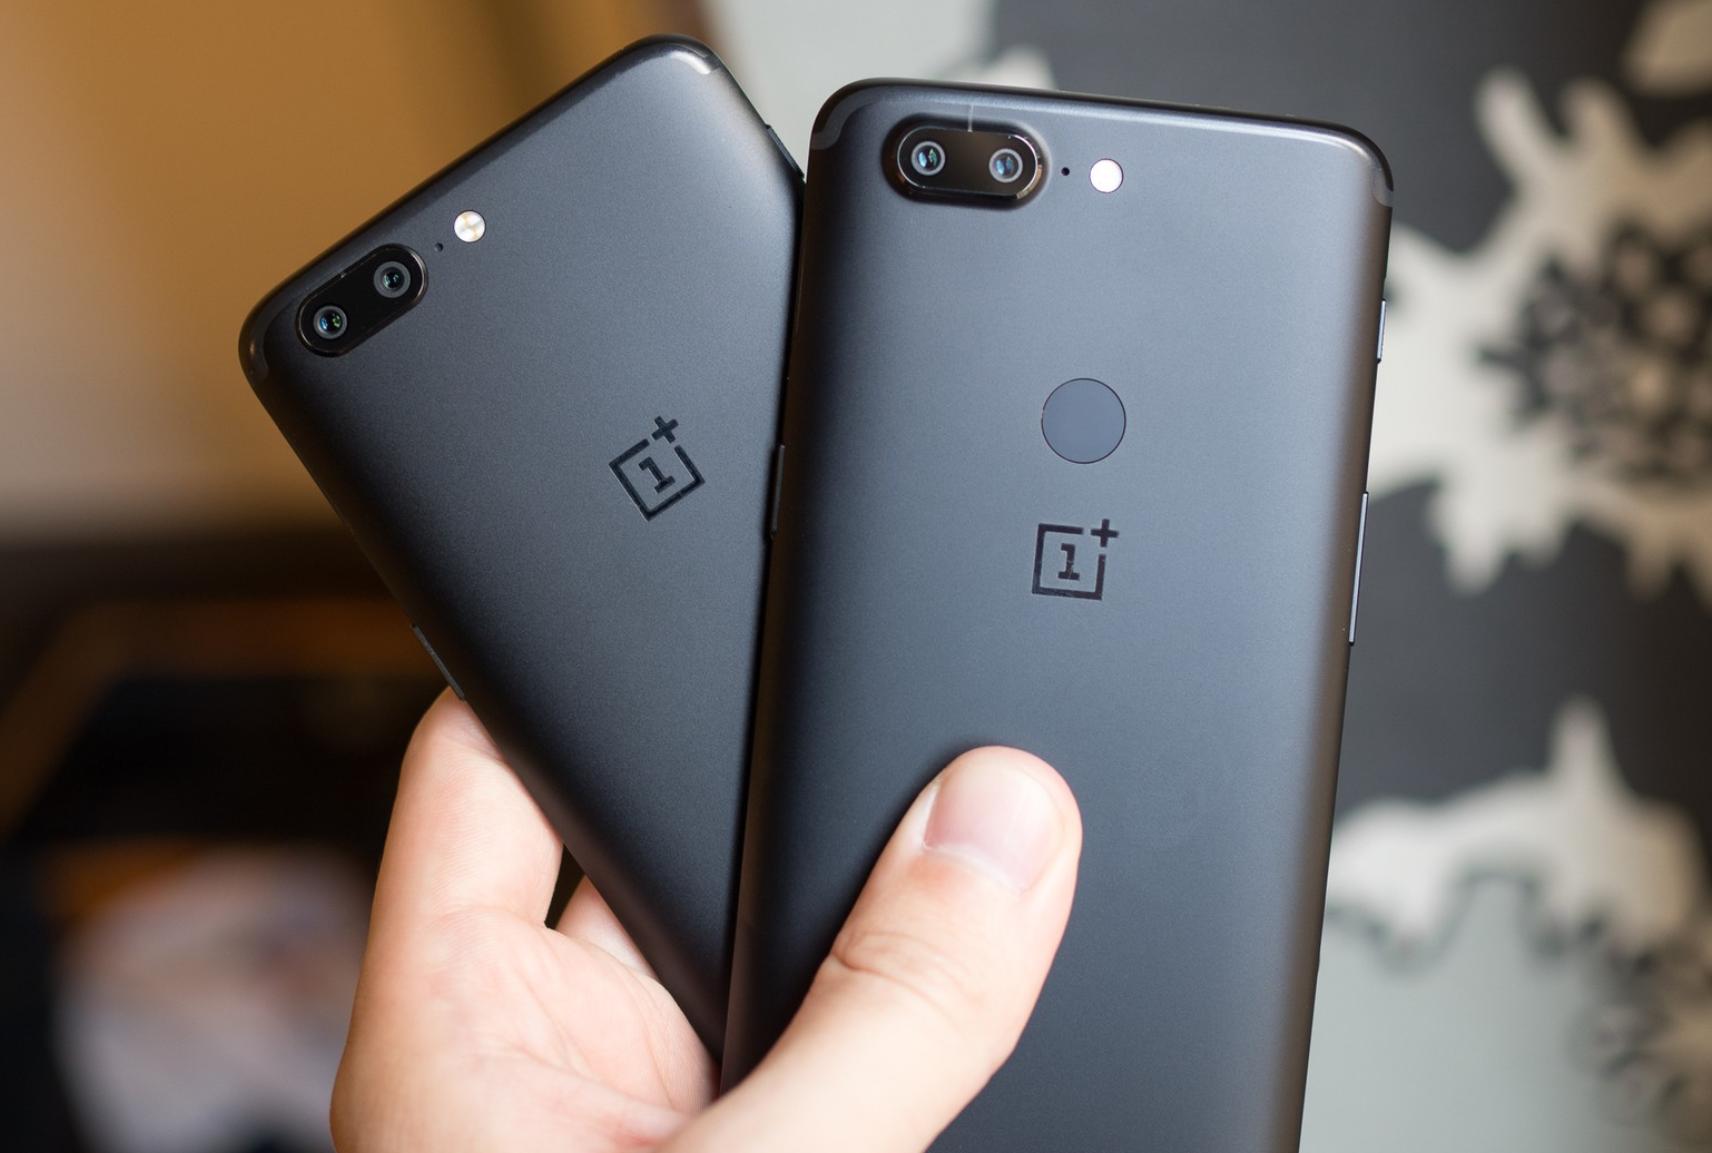 OnePlus может отказаться отвыпуска флагмана 6Т